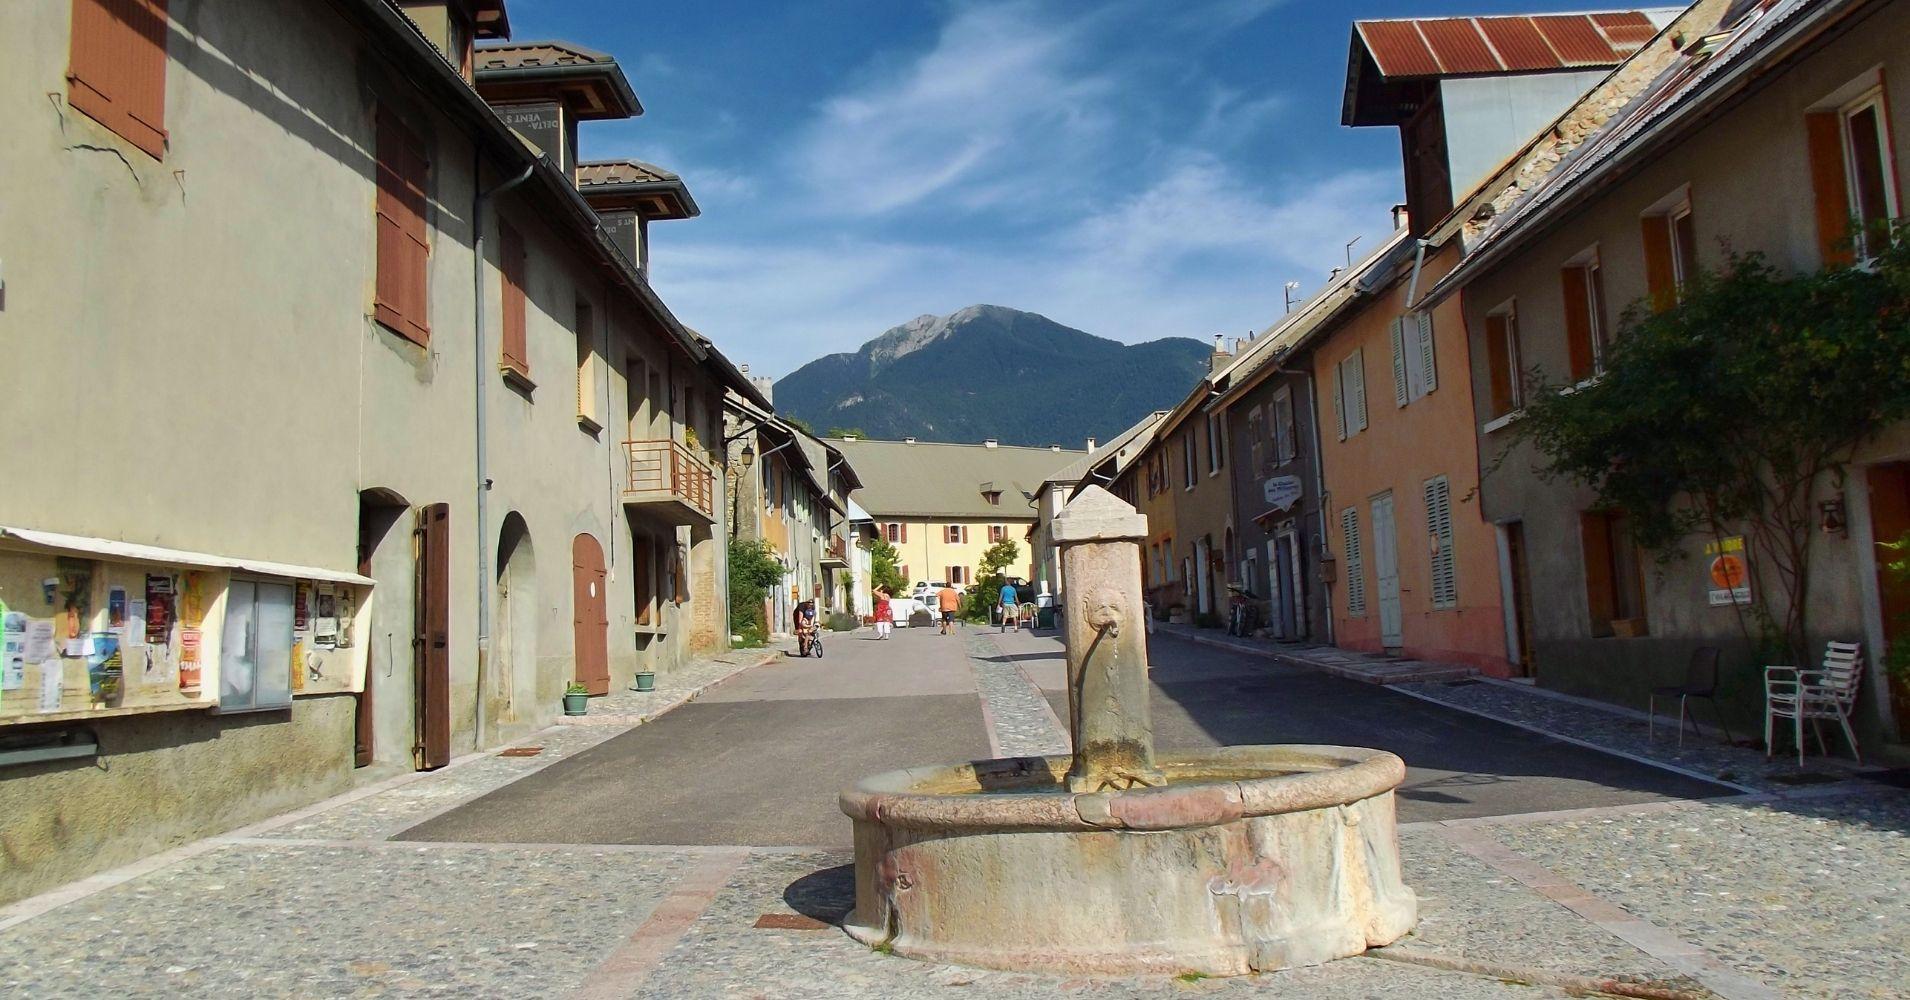 Mont Dauphin Fuerte de Vauban. Altos Alpes. Región Provenza-Alpes-Costa Azul. Francia.